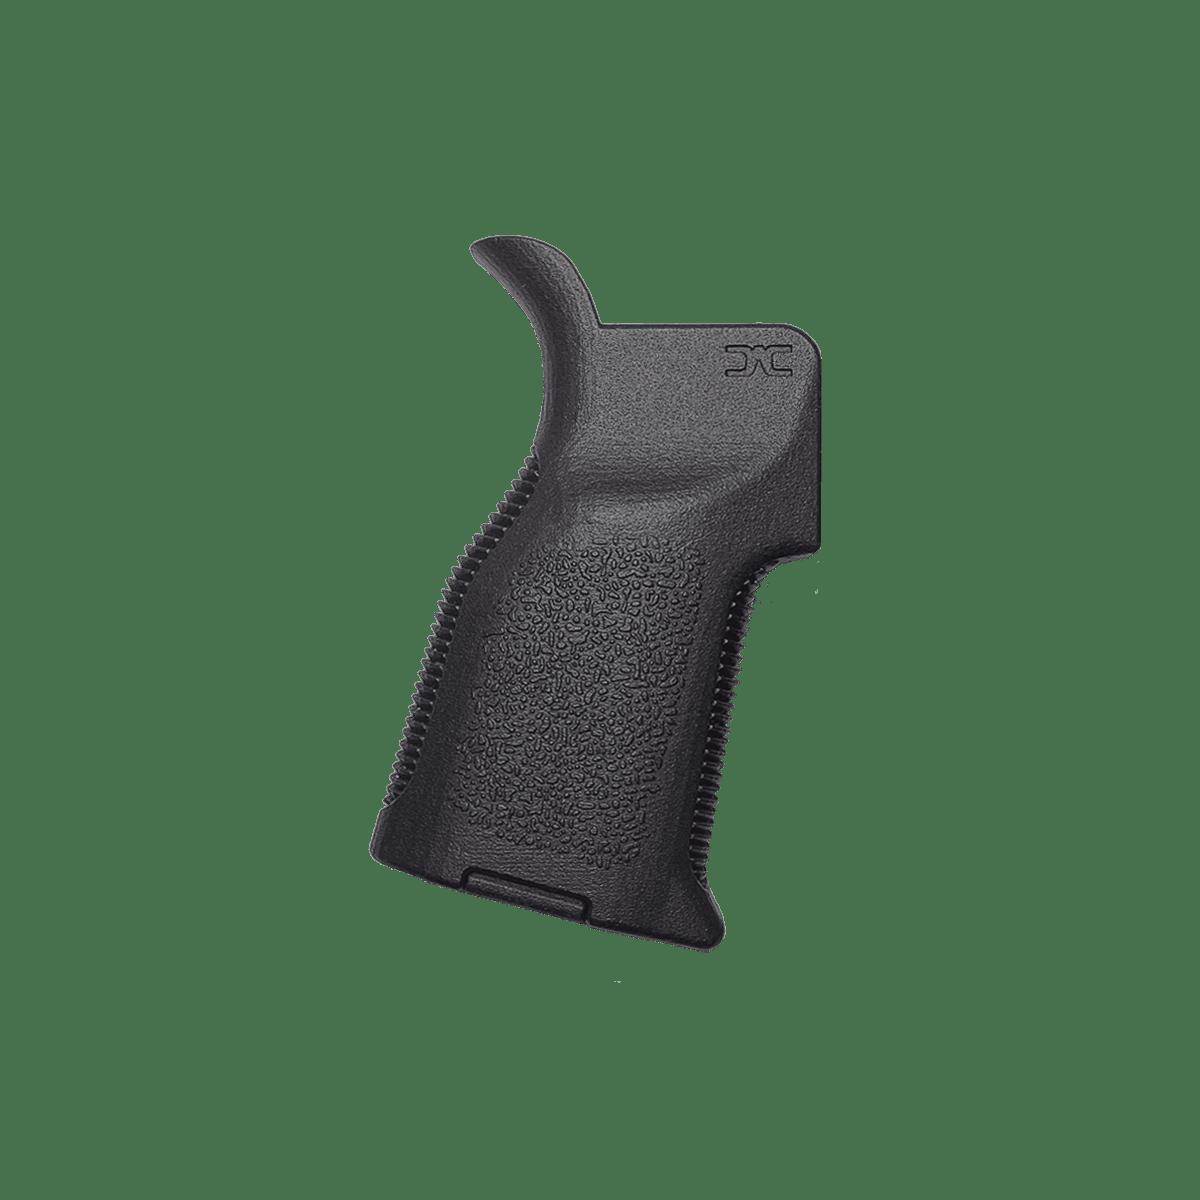 driven arms co ultralight compact grip ulcg ar-15 ar15 grips